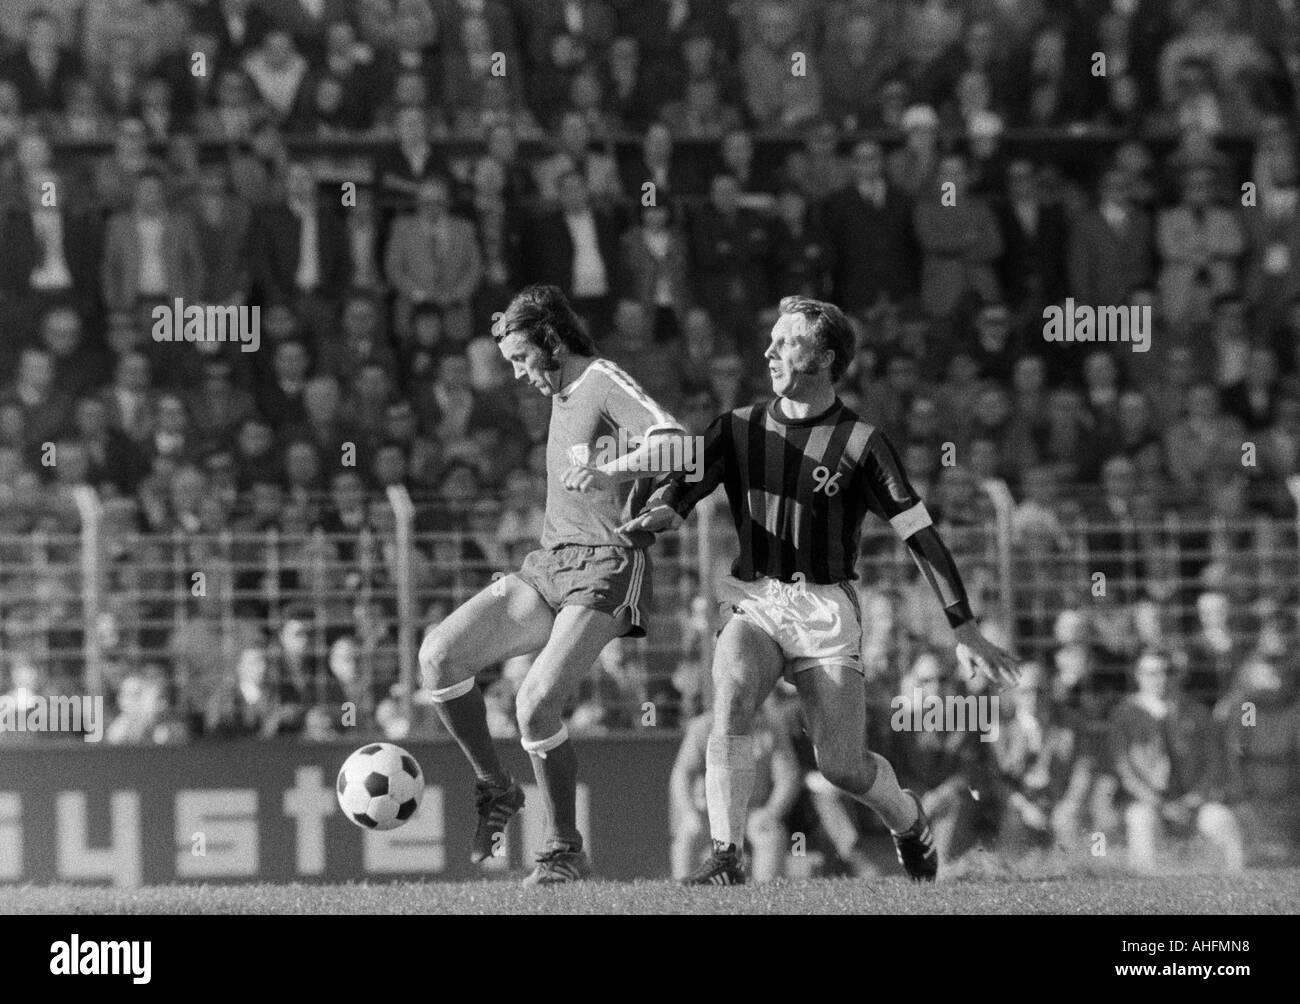 football, Bundesliga, 1971/1972, VfL Bochum versus Hanover 96 2:2, Stadium at the Castroper Strasse in Bochum, scene of the match, duel between Reinhold Wosab (Bochum) left and Hans Siemensmeyer (96) - Stock Image